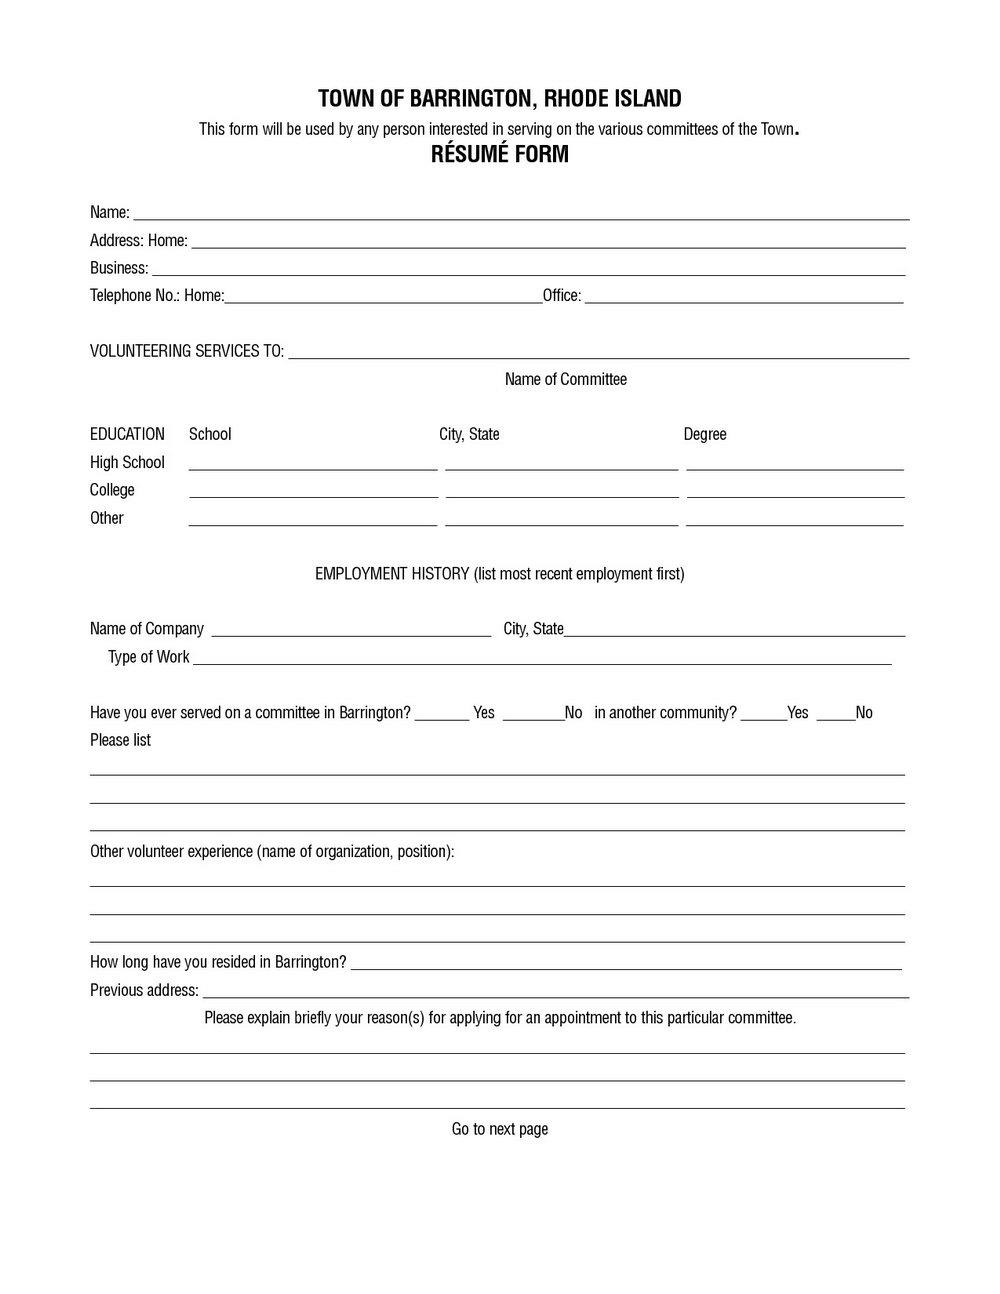 Free Resume Printable Forms